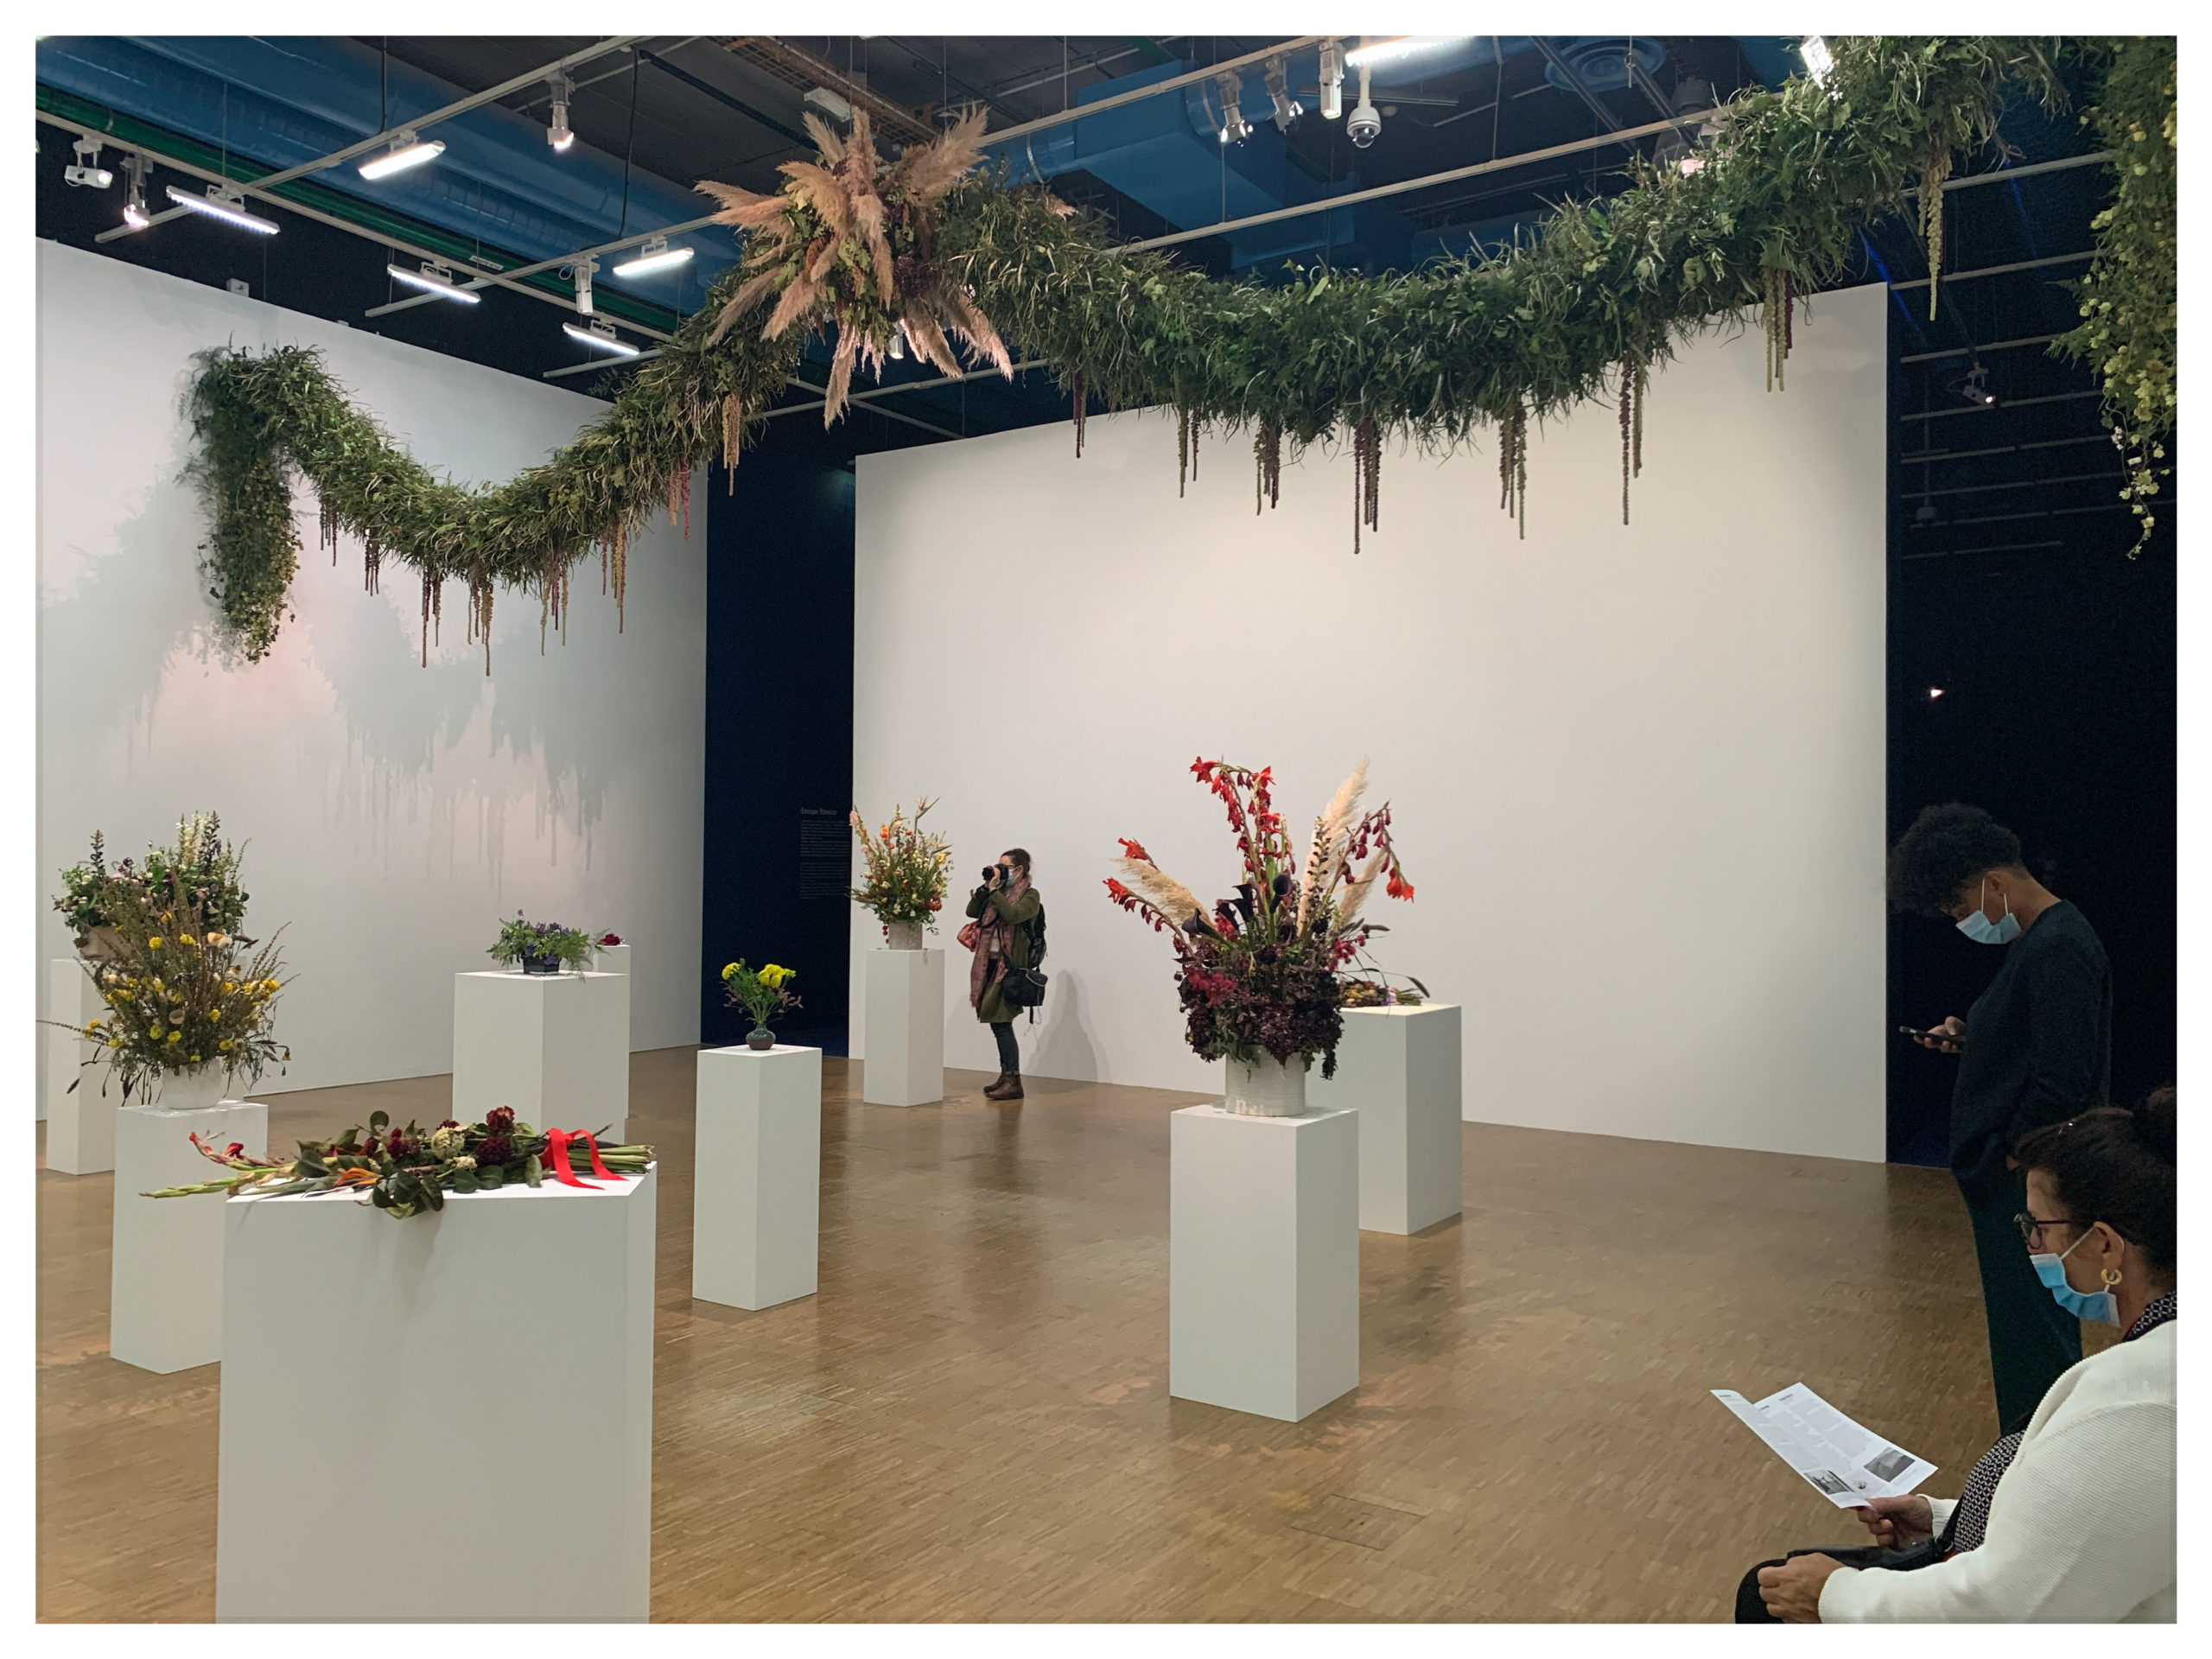 Kapwani Kiwanga, Prix Marcel Duchamp 2020, courtesy artvisions